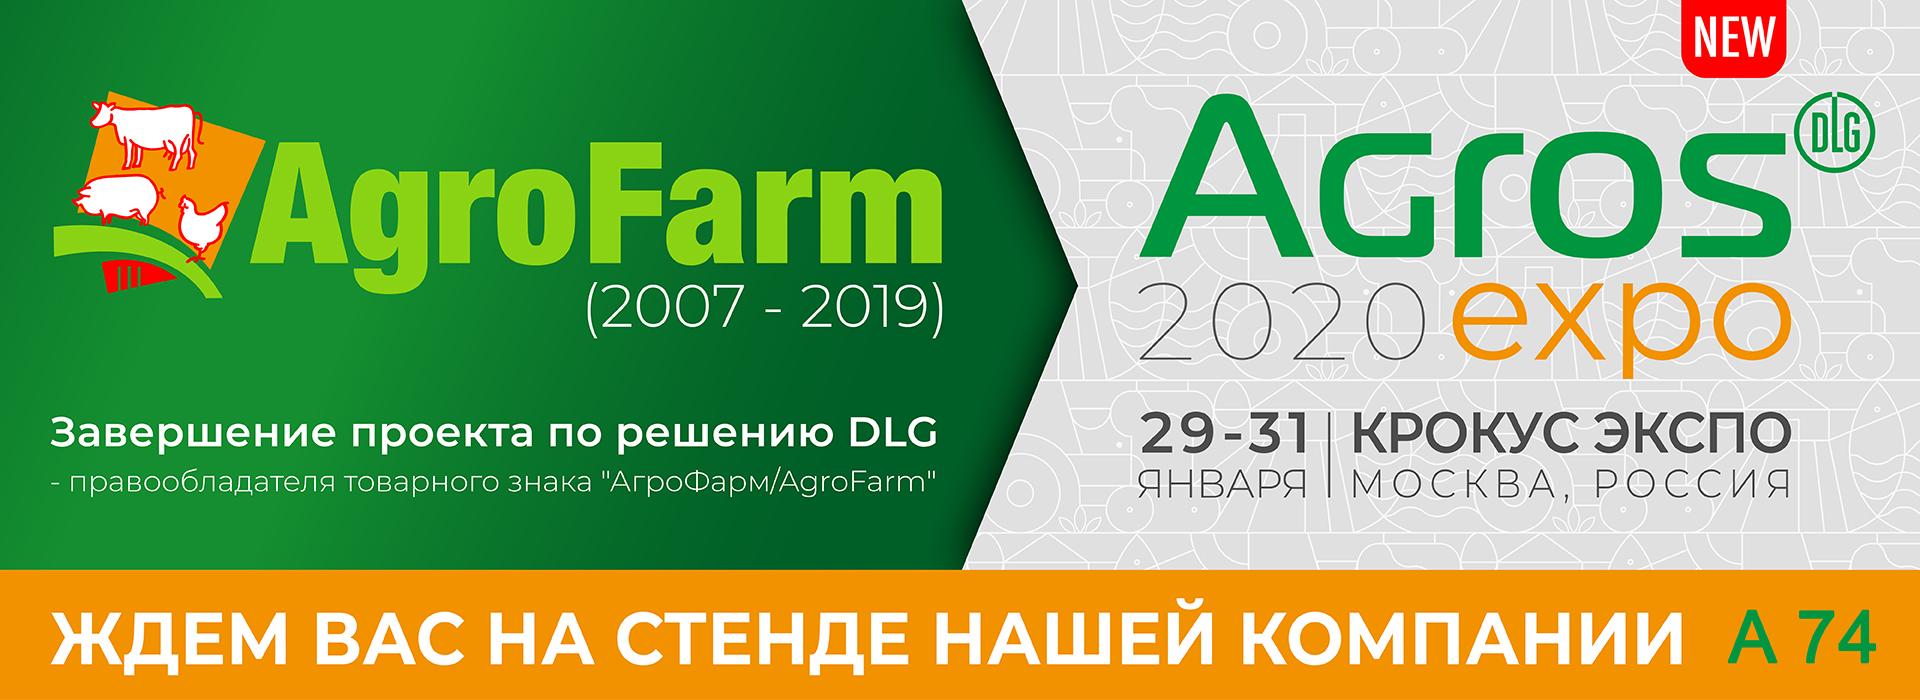 Agros Expo